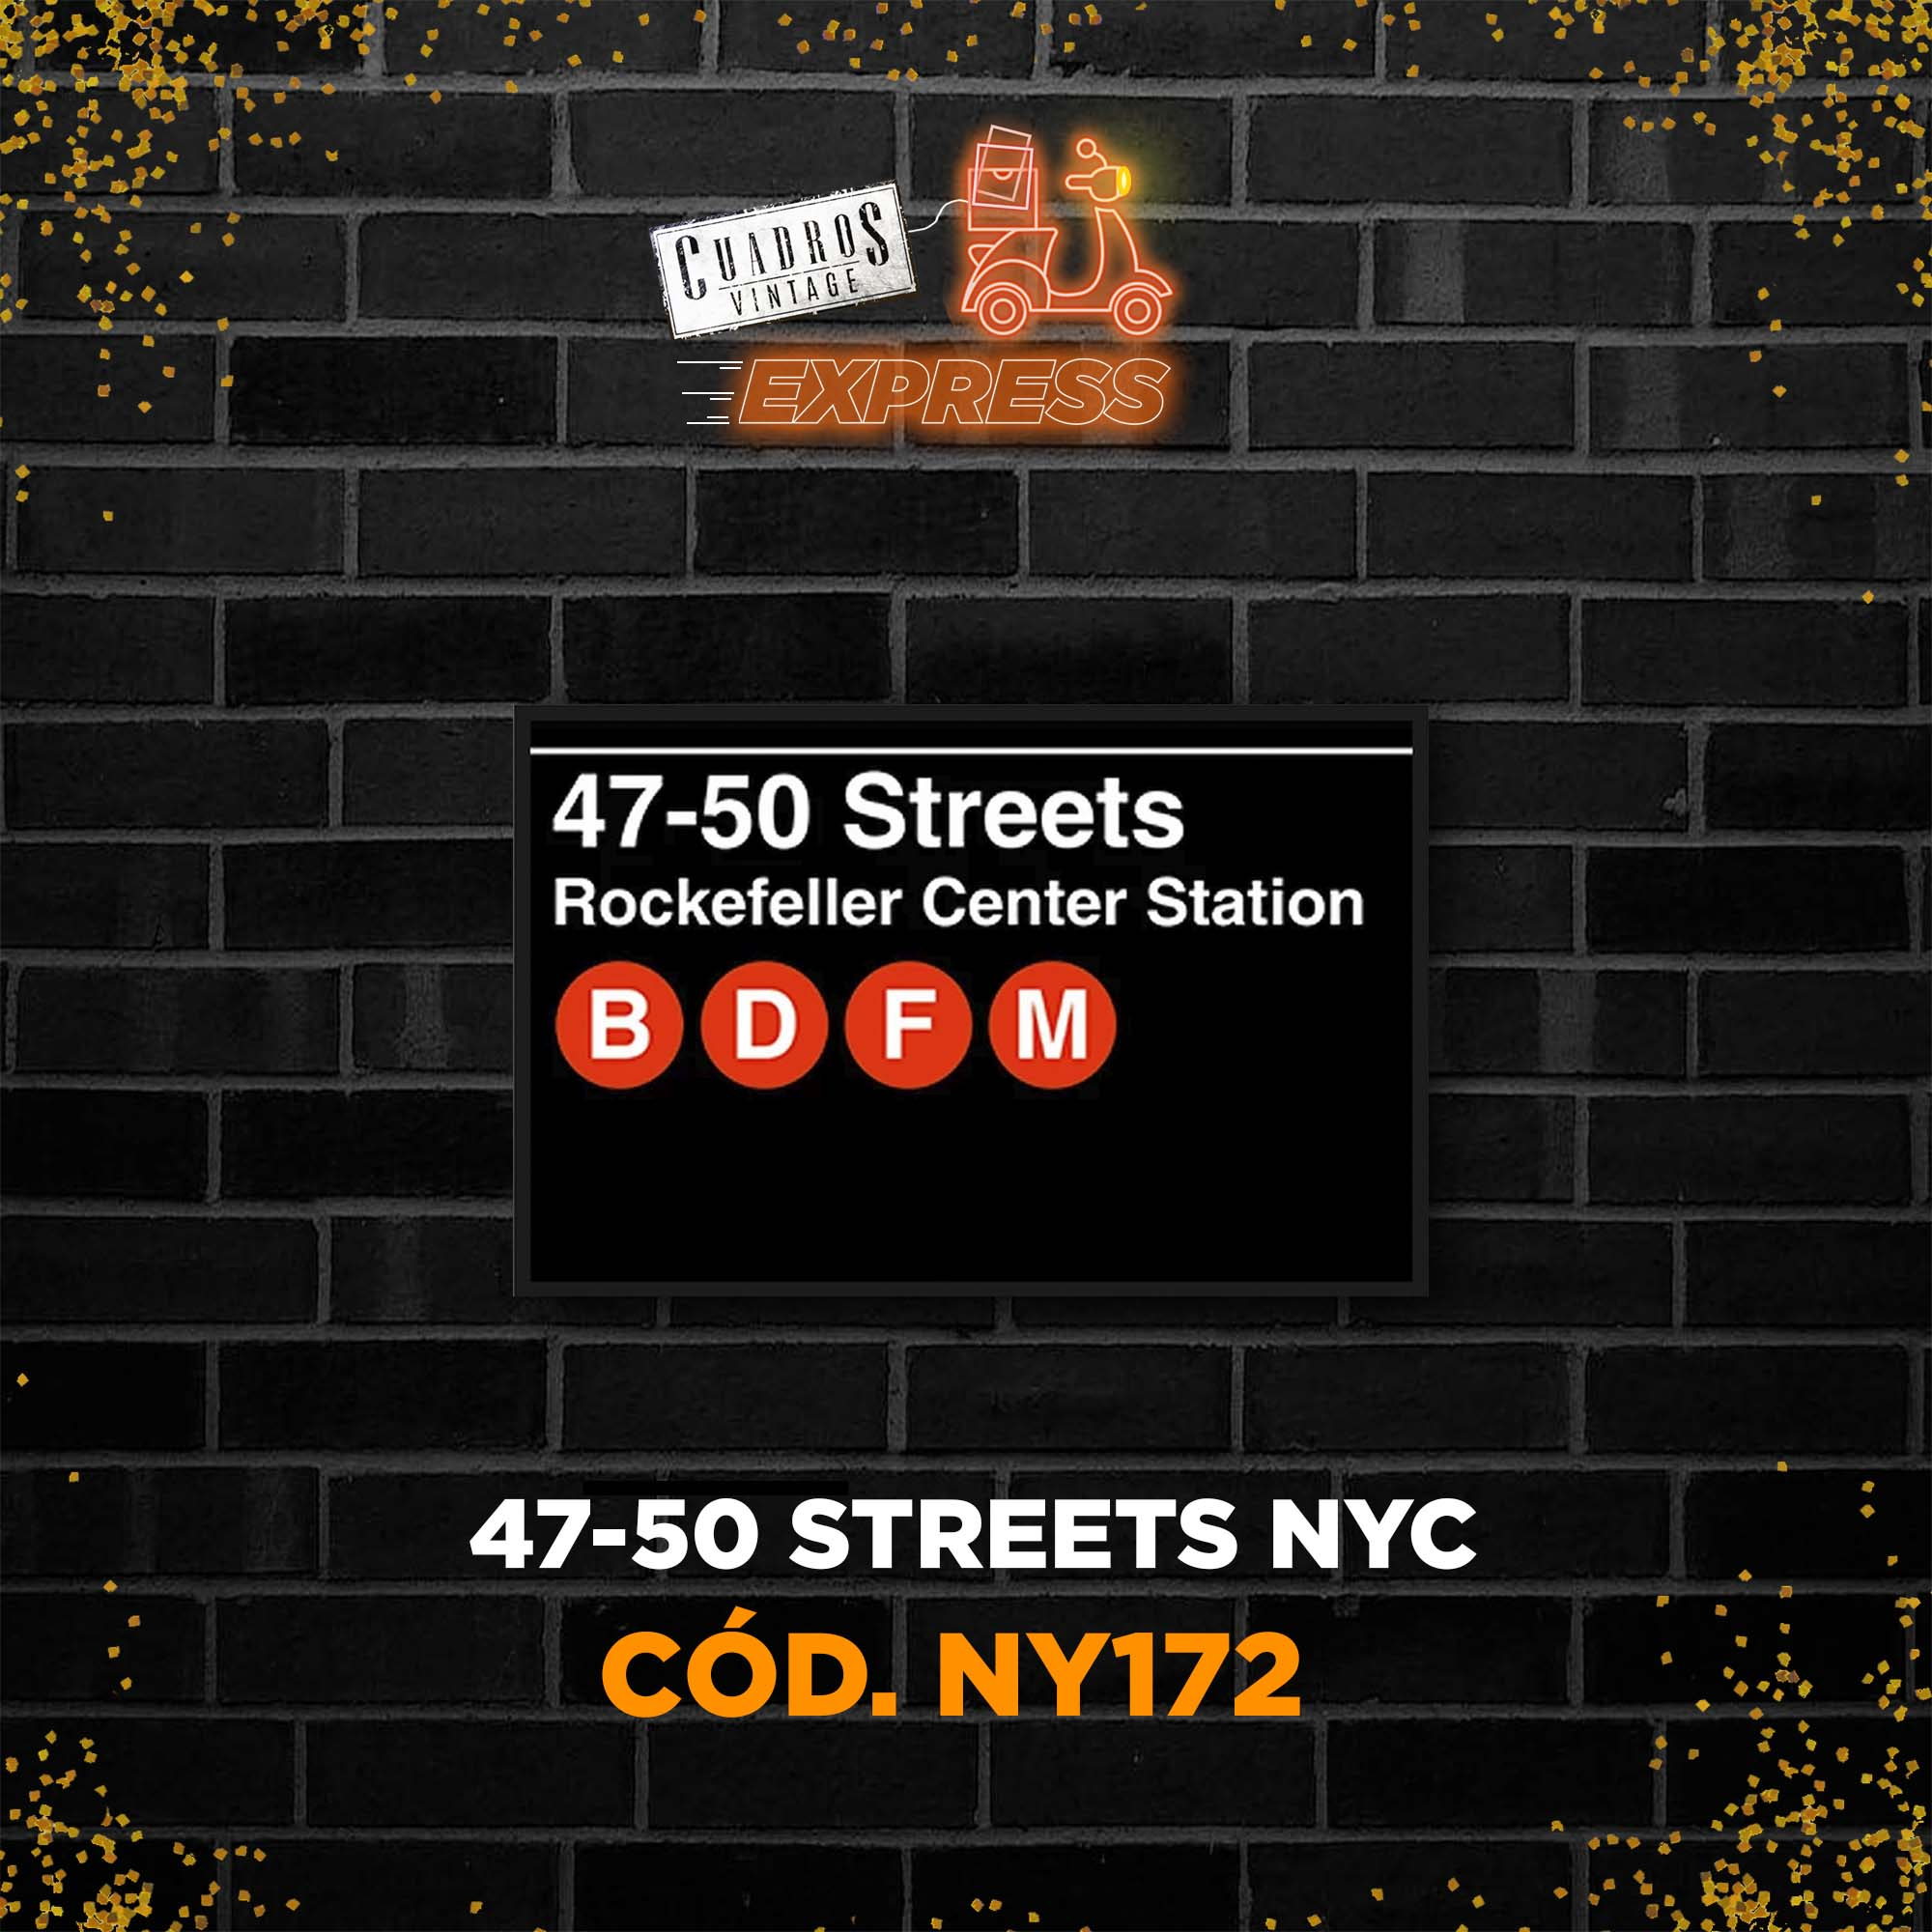 Medidas: 47-50 Streets NYC